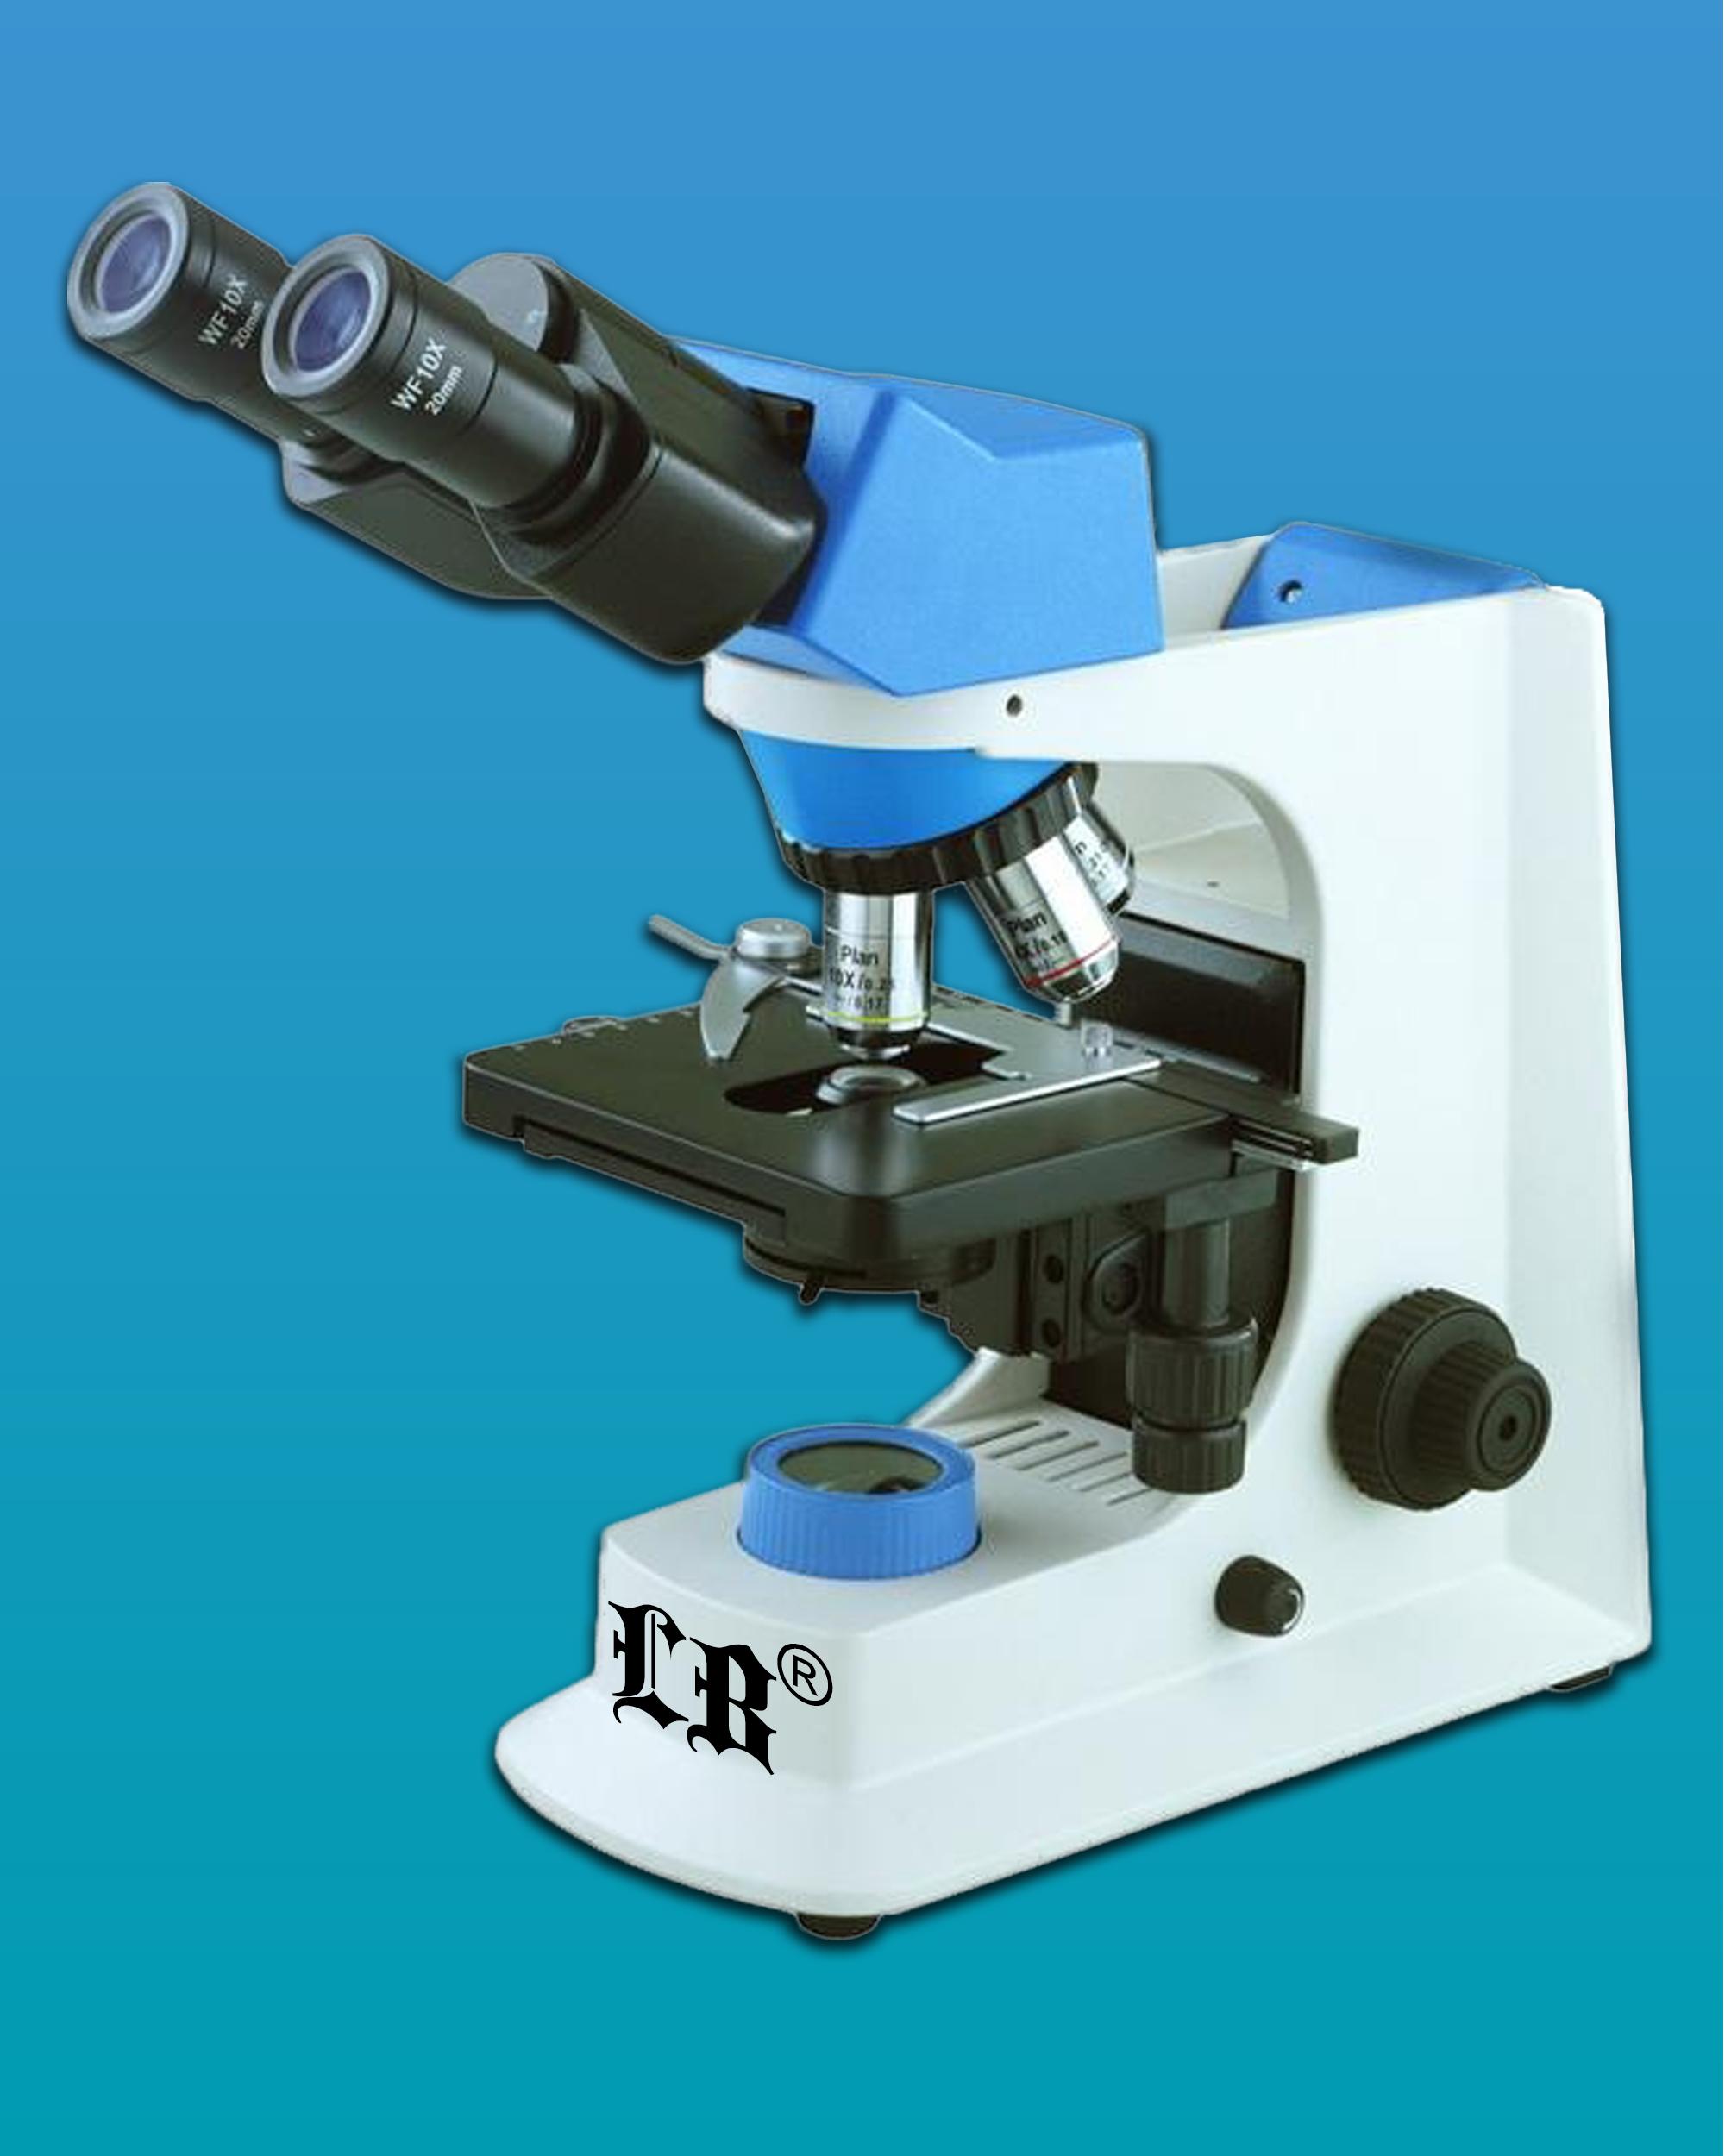 [LB-270] Biological/ Medical Binocular Microscope w/ Infinite Optical System & Infinity Color Correction